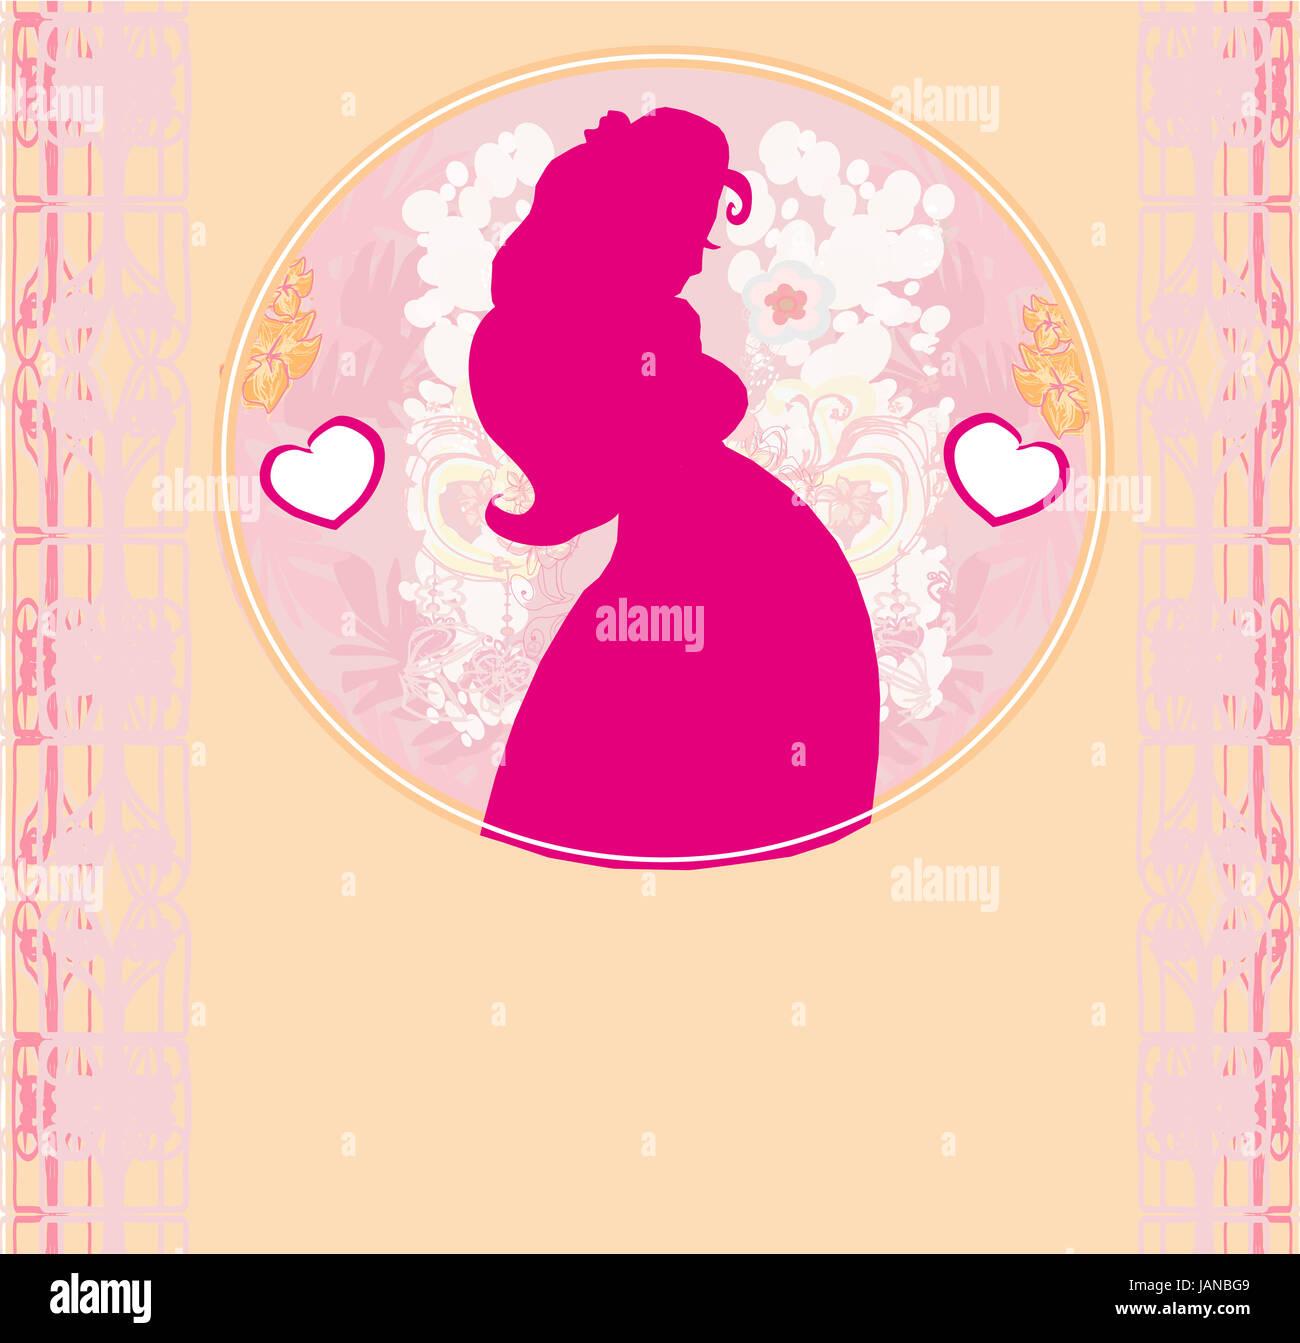 Baby shower cartoon invitation silhouette of pregnant woman stock baby shower cartoon invitation silhouette of pregnant woman filmwisefo